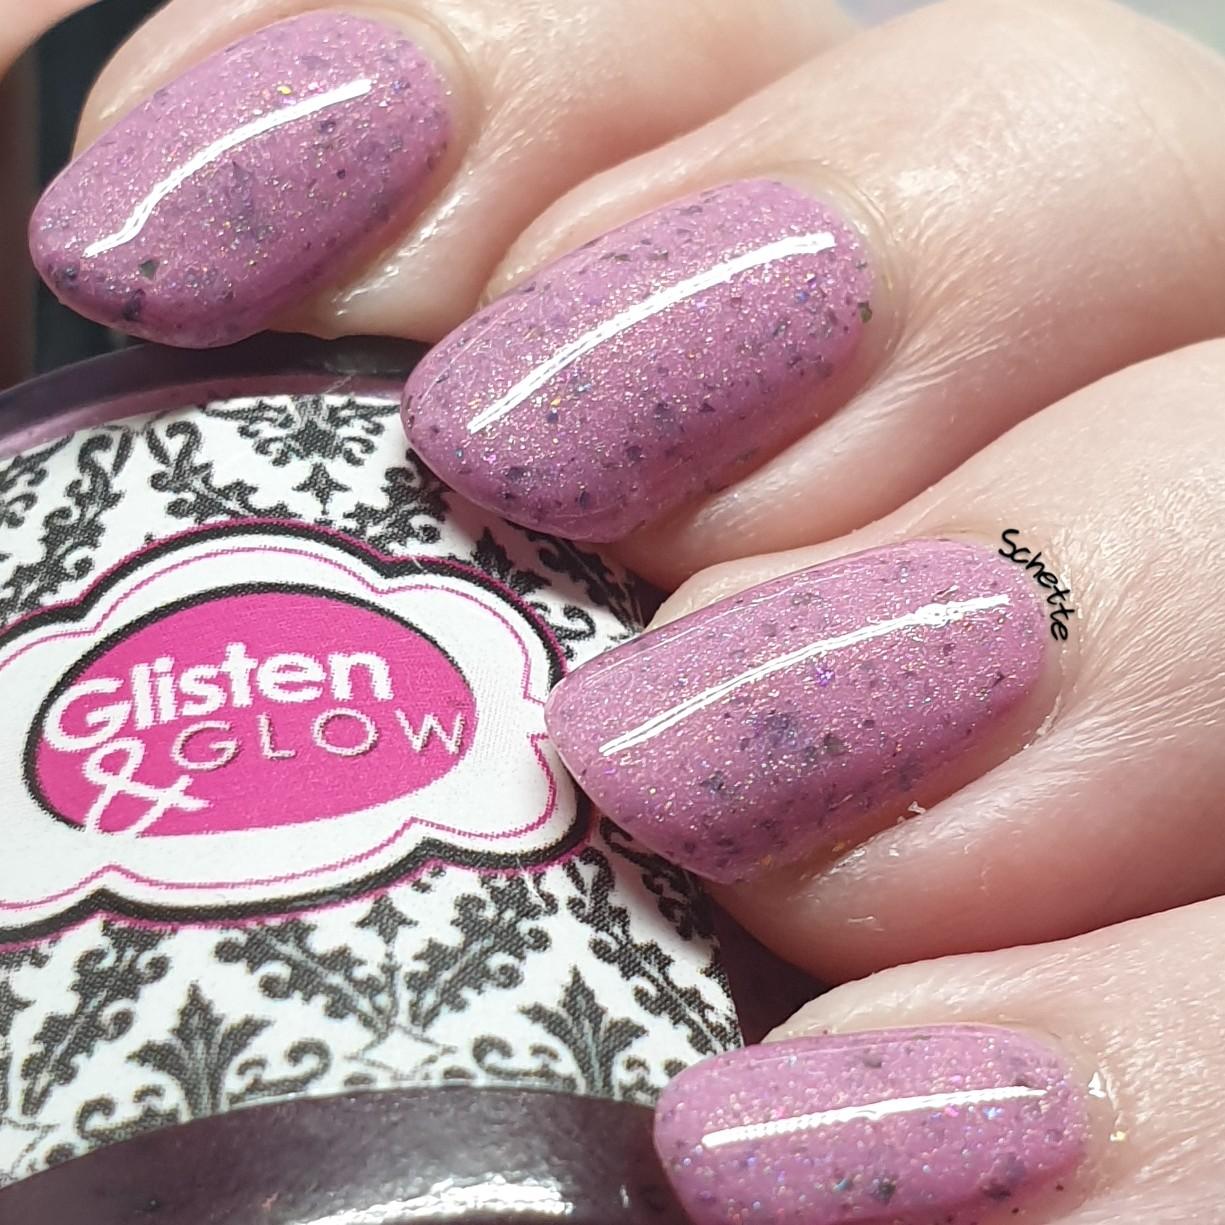 Glisten & Glow - Gone Glamping